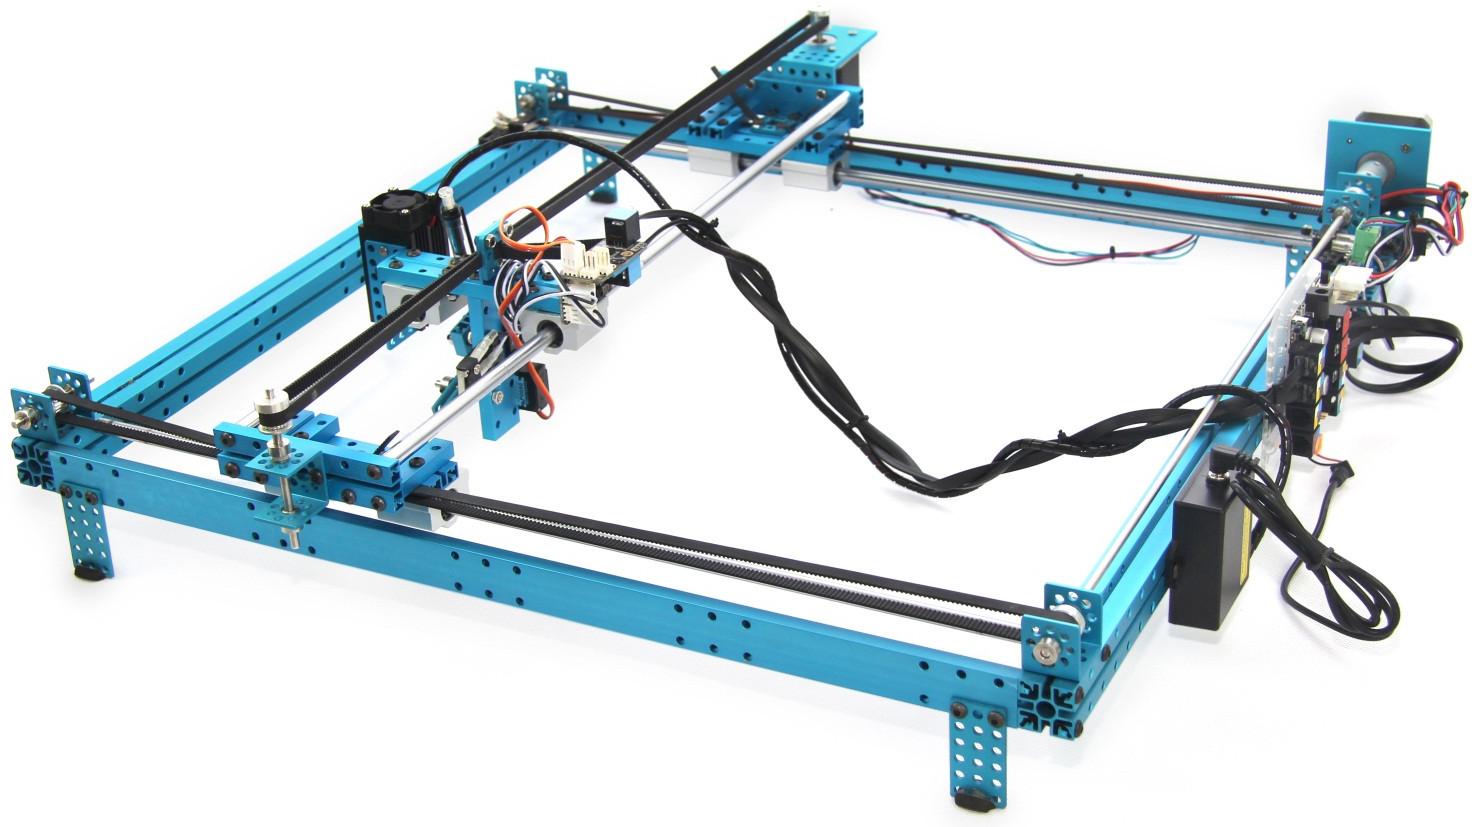 Best ideas about DIY Laser Cutter Kit . Save or Pin Makeblock Laser Engraver for XY Plotter Robot Kit V2 0 Now.